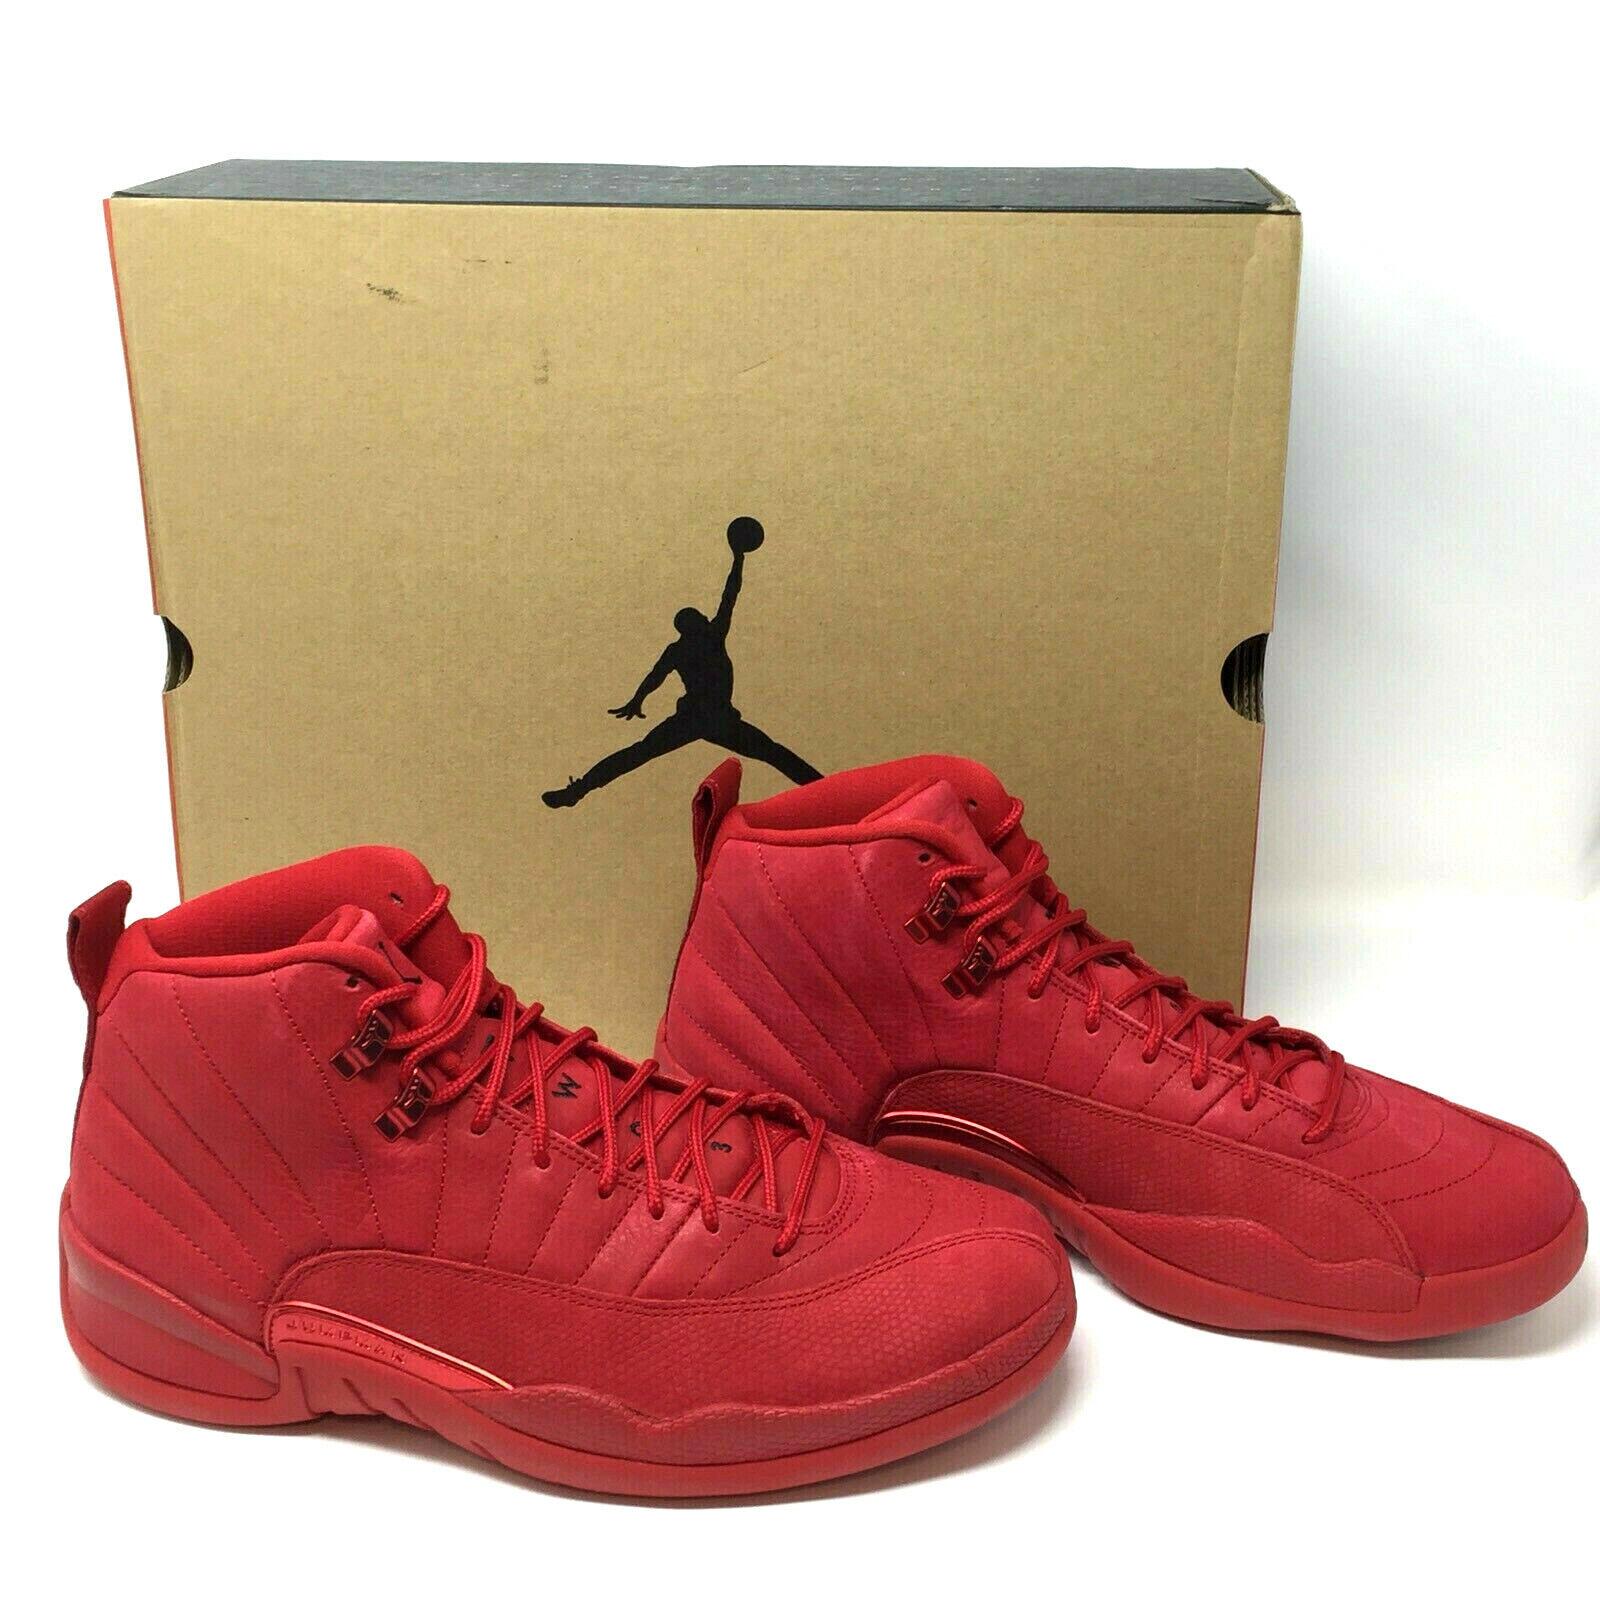 best cheap d1f82 7f6f7 2018 Nike Air Jordan 12 XII Retro Gym Red Size 10.5 Shoes Mens Bulls  130690-601